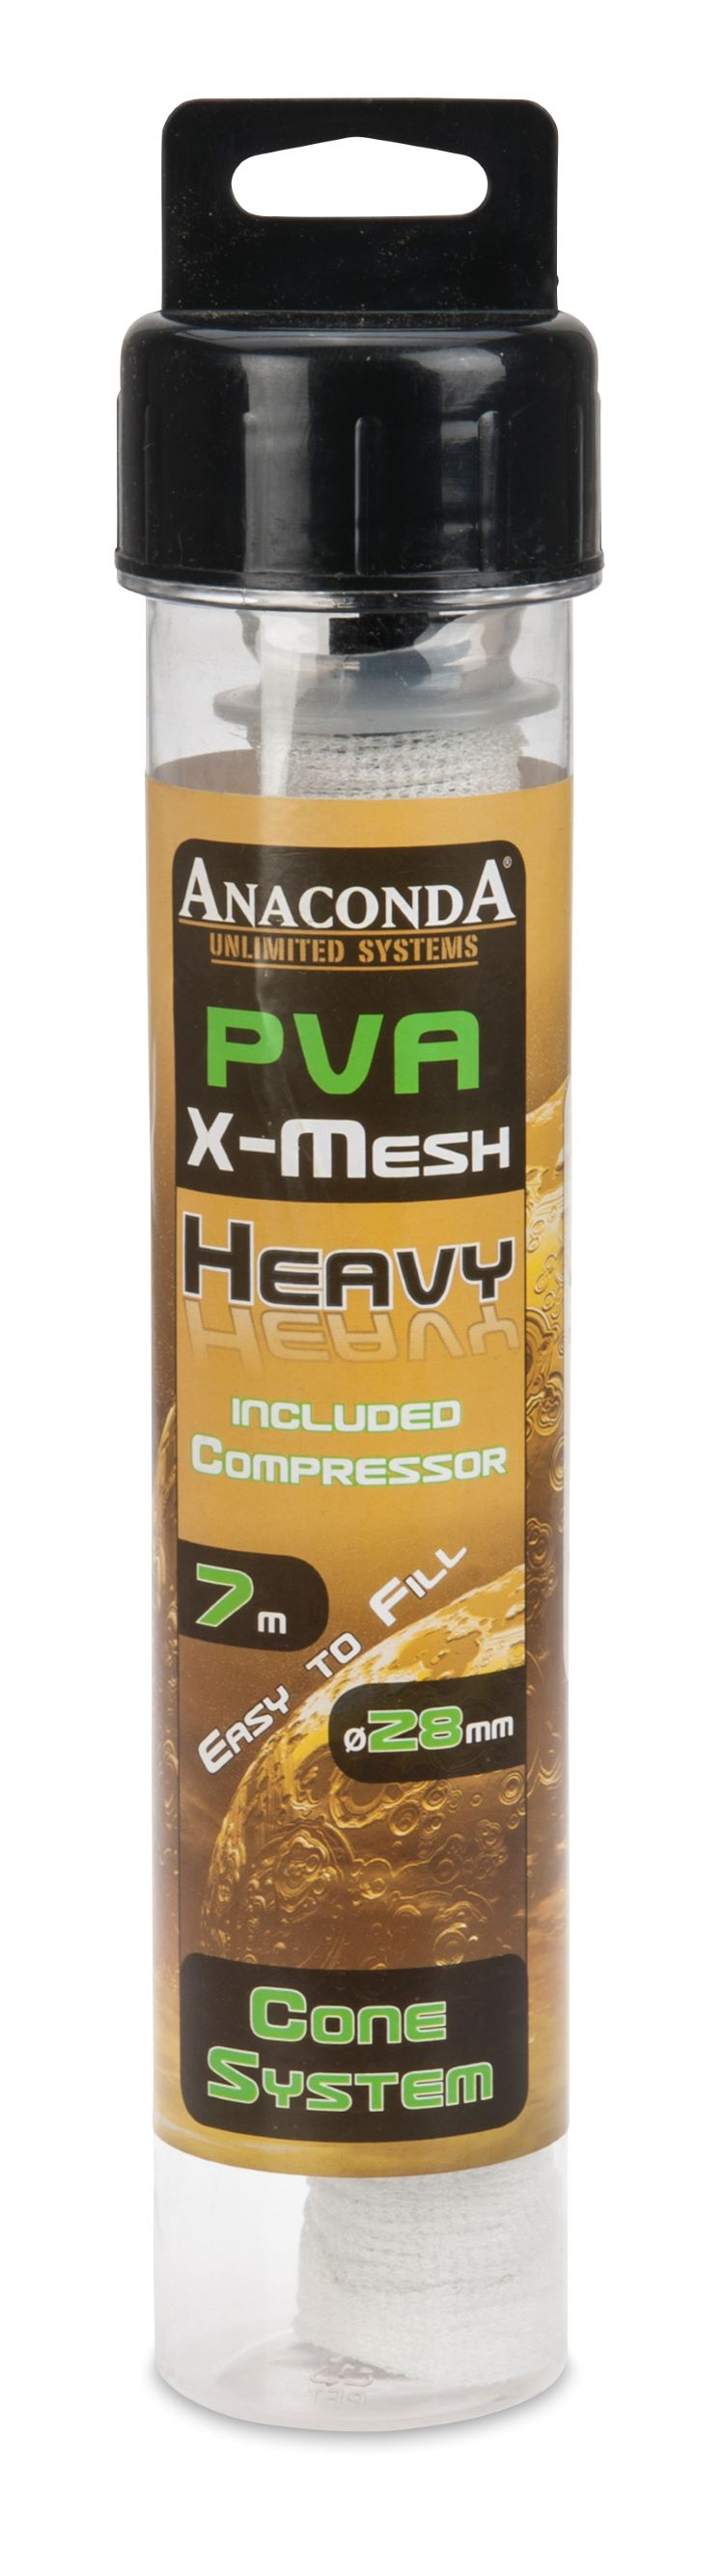 Anaconda PVA X-Mesh průměr: 28 mm